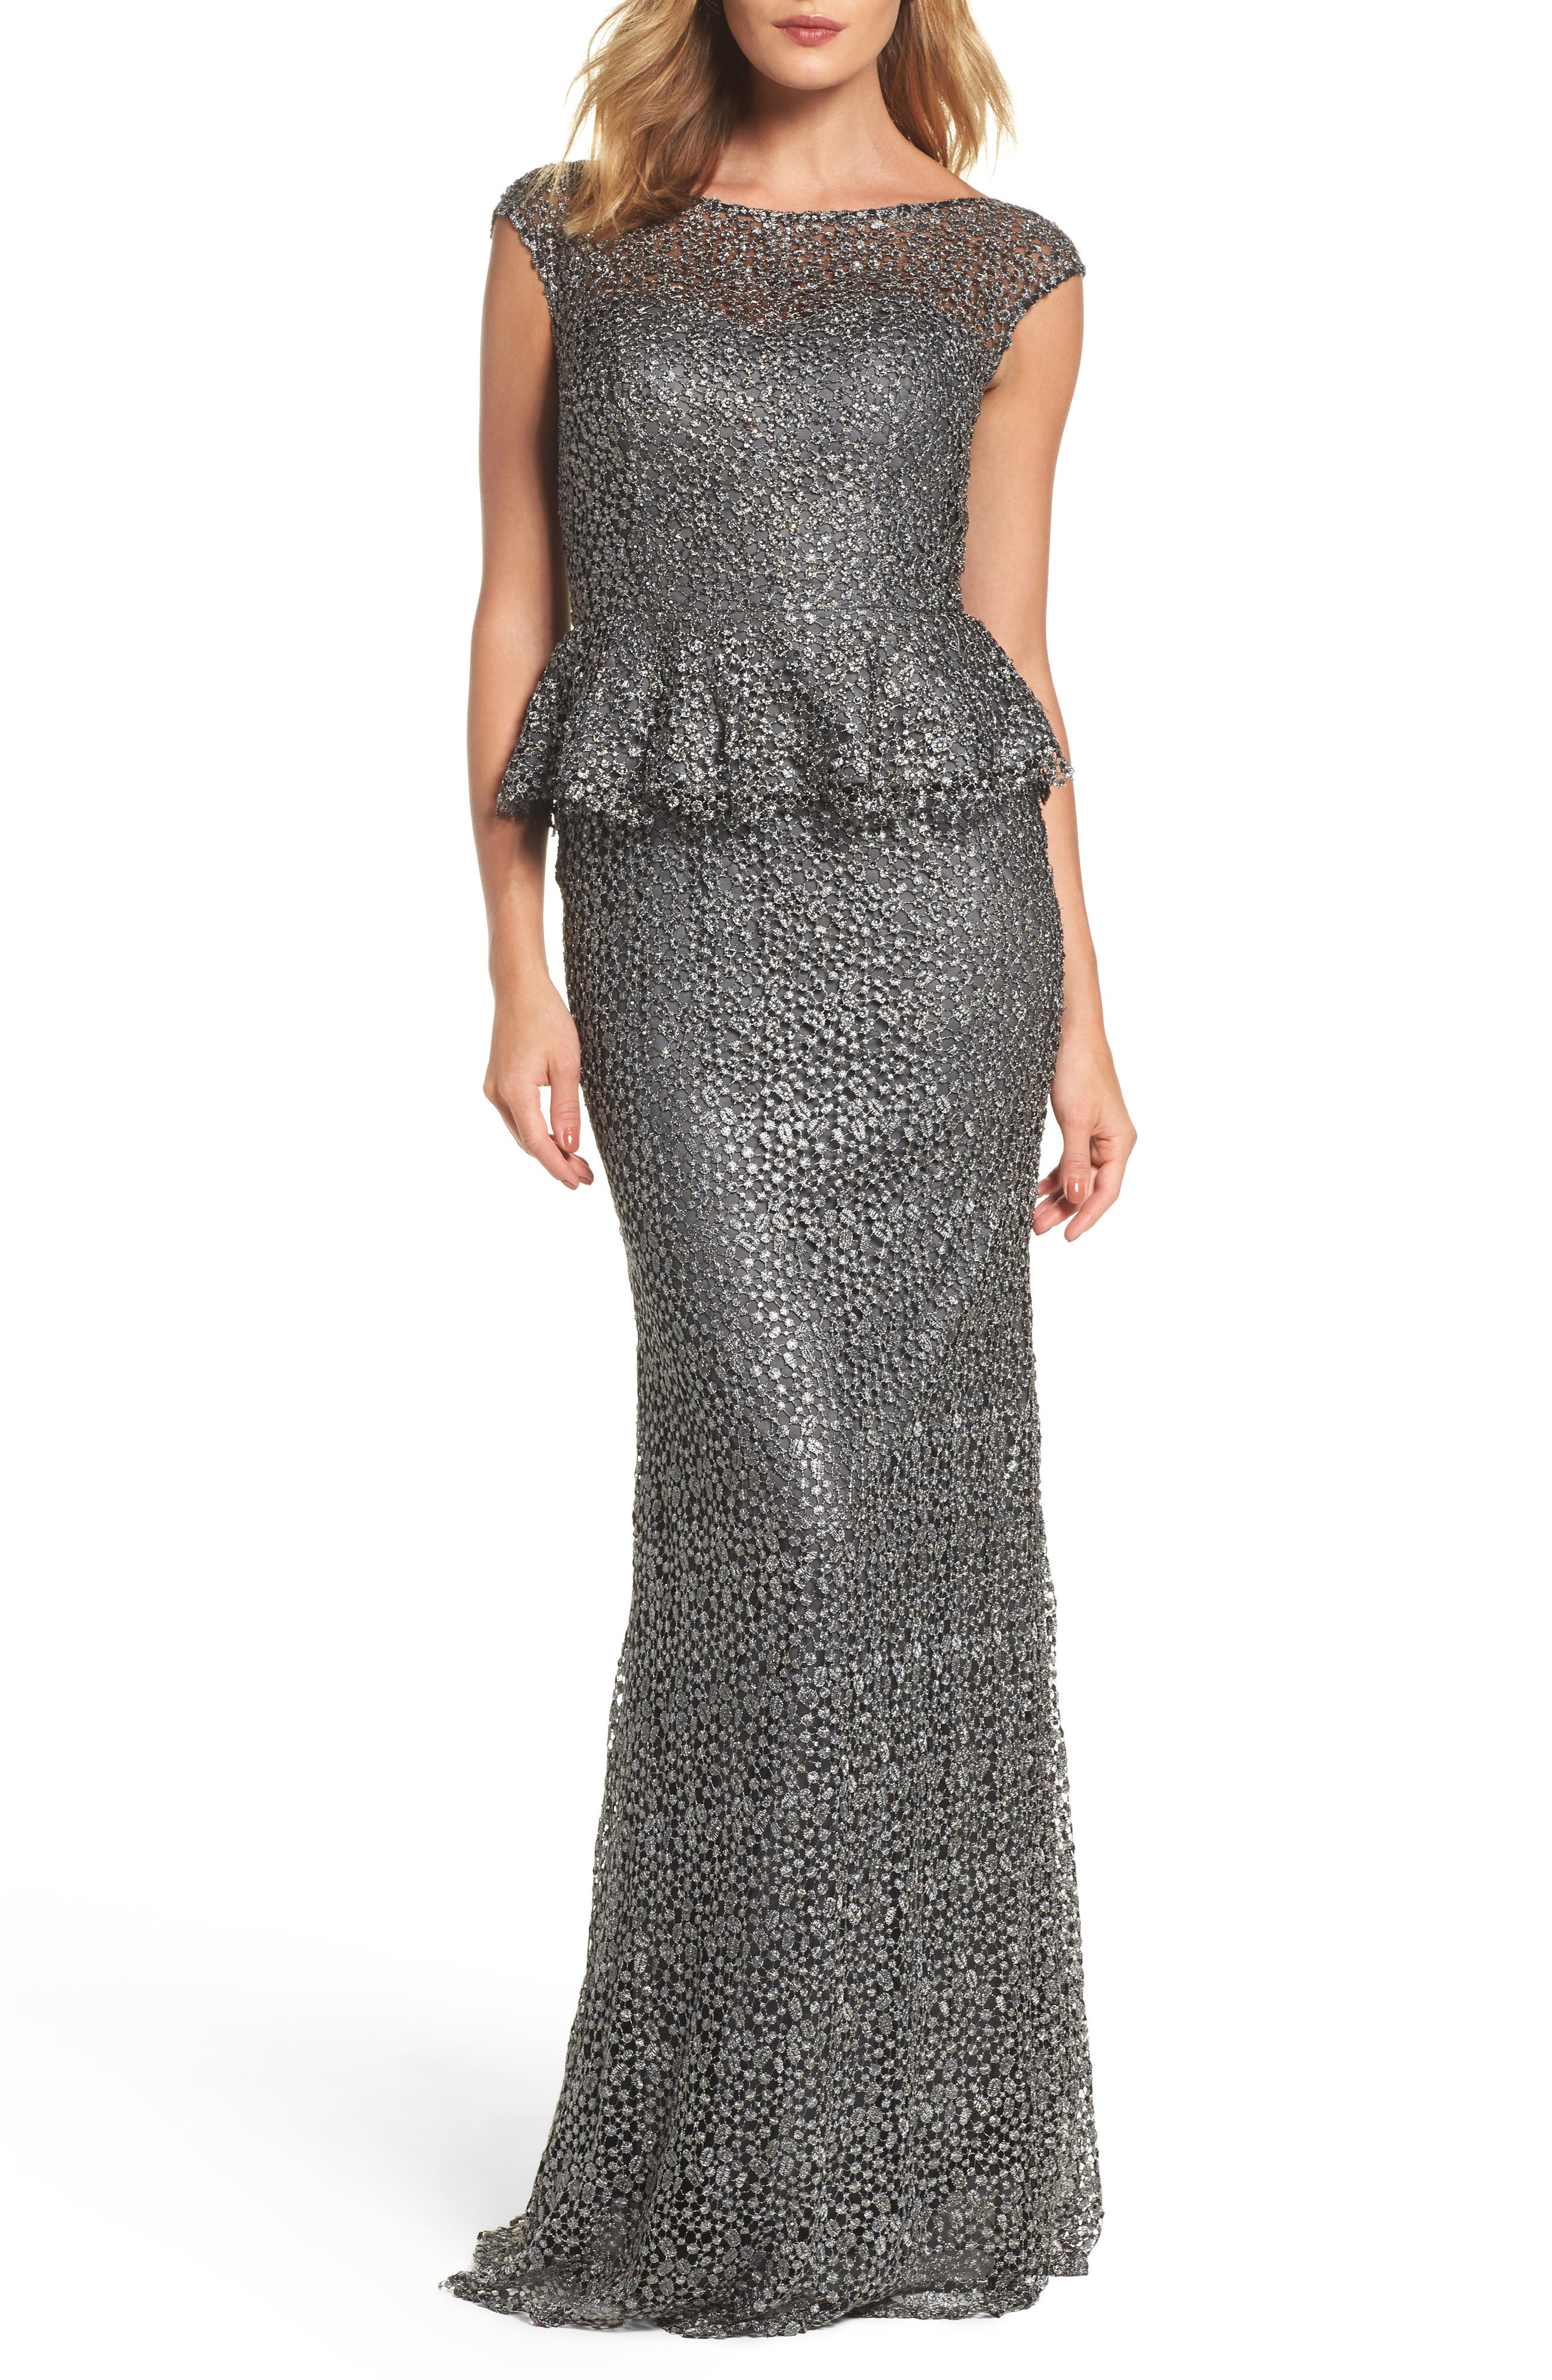 LA FEMME Embellished Lace Peplum Gown, Main, color, GUNMETAL